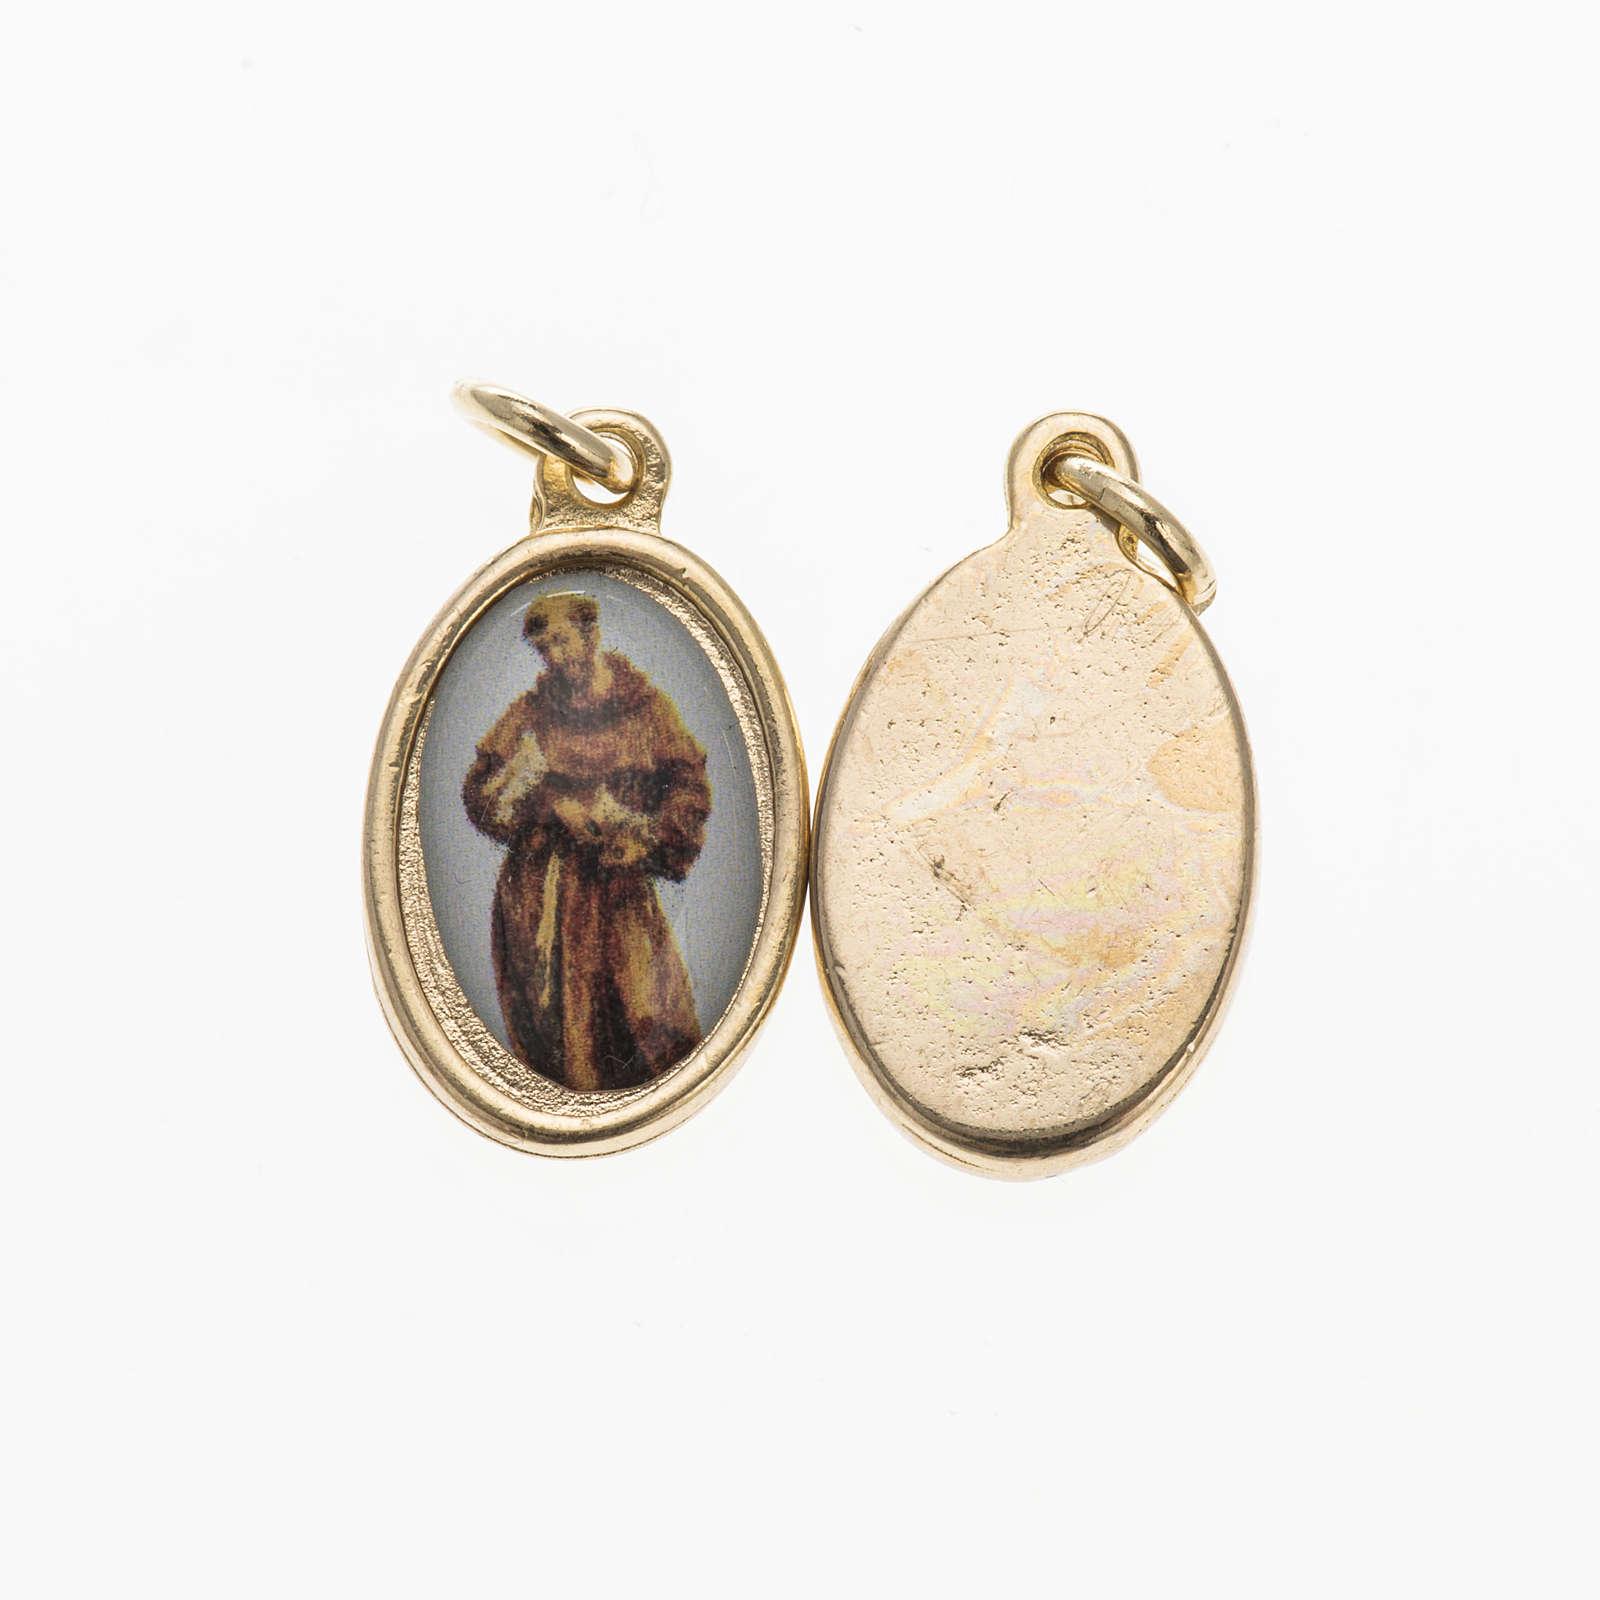 Medaglia San Francesco metallo dorato resina 1,5x1 cm 4